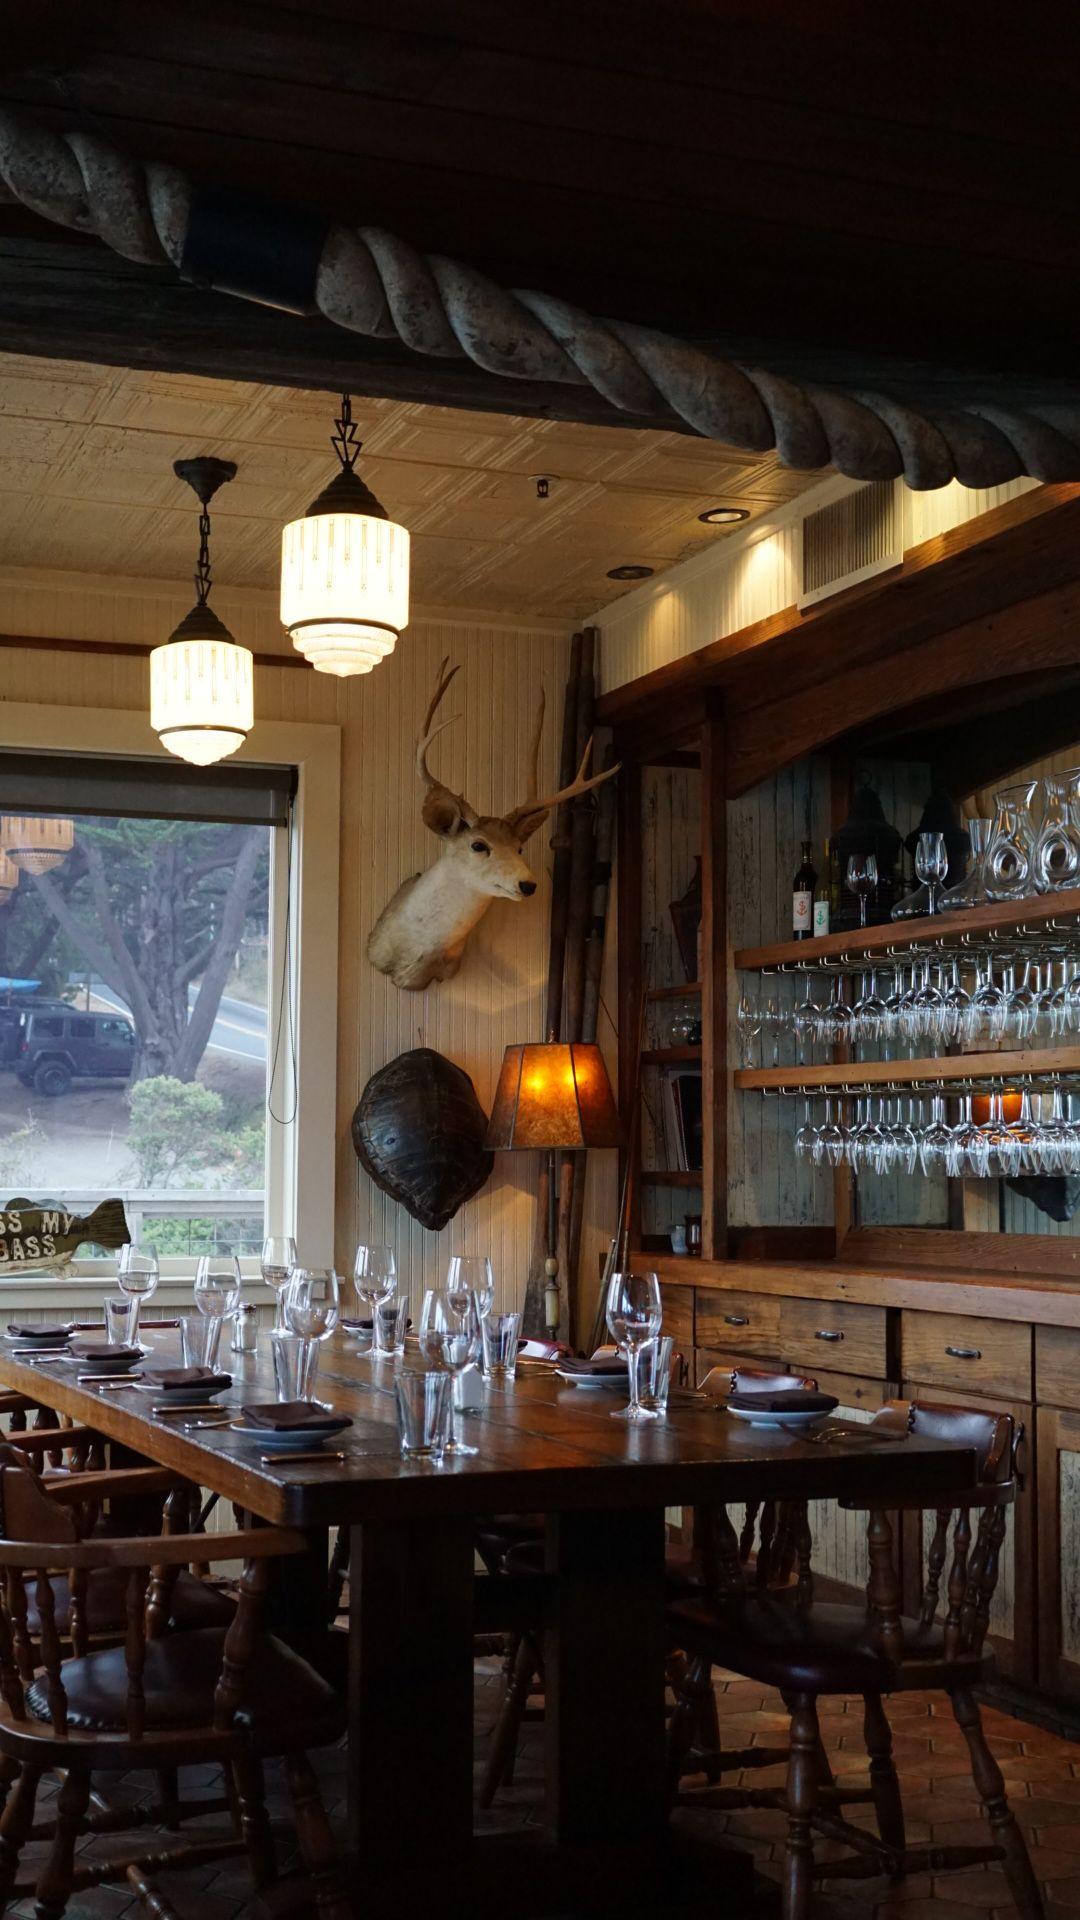 Restaurant at Nick's Cove Decor, Home decor, Restaurant